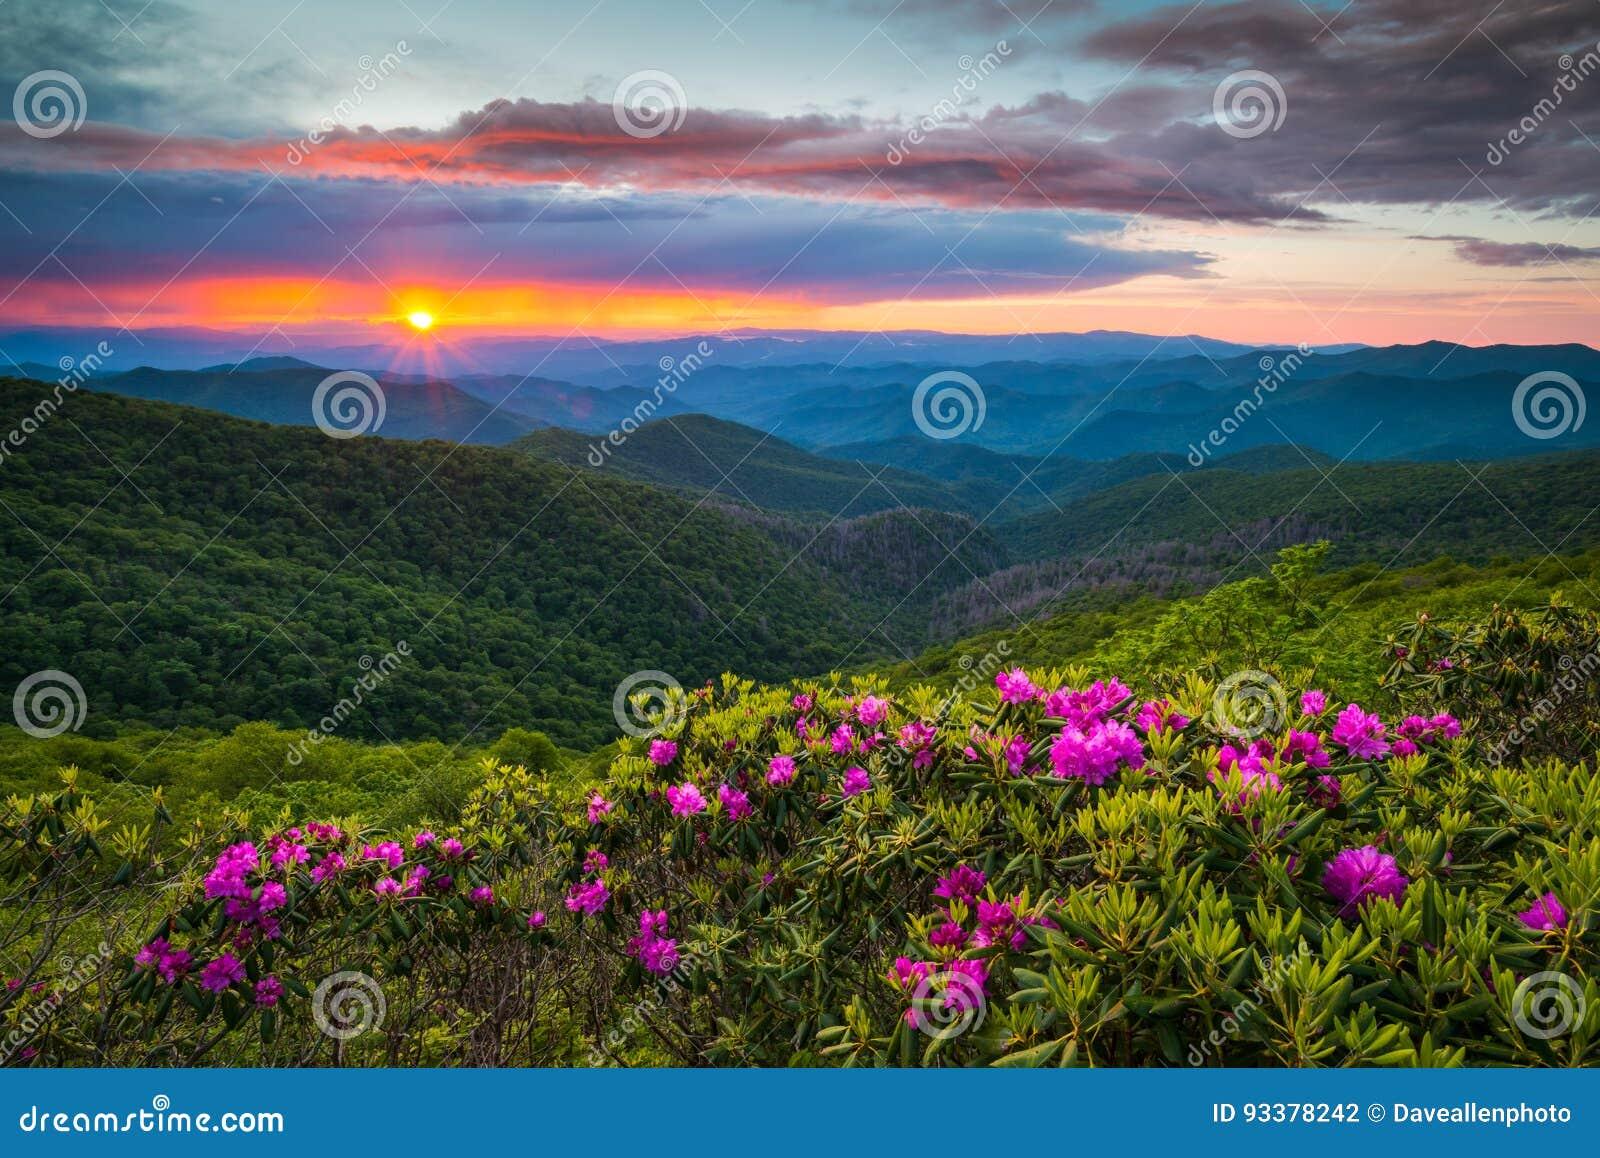 North Carolina Blue Ridge Parkway Spring Flowers Scenic Mountain